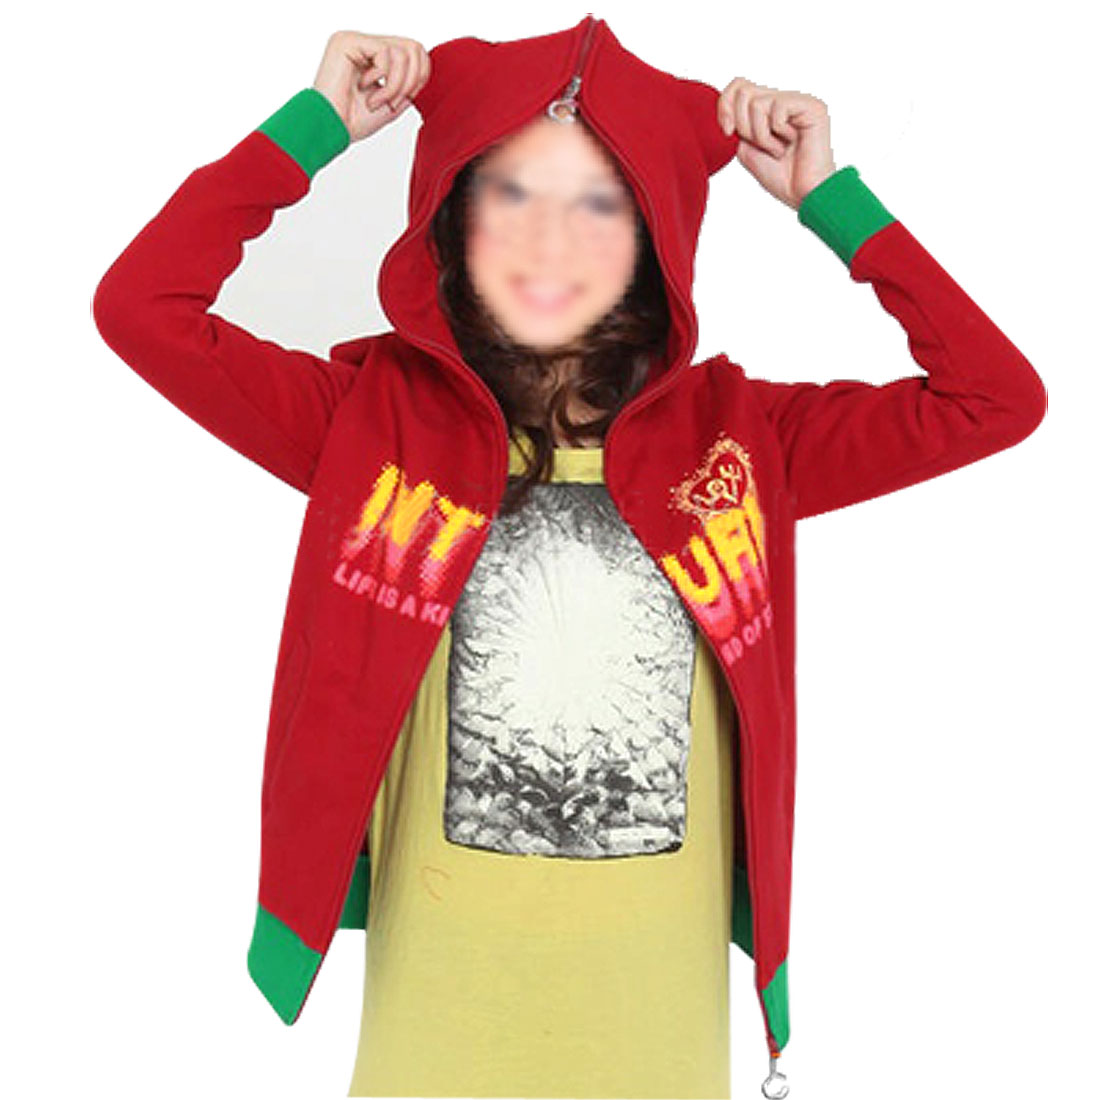 Lady Red Green Trim Two-Sides Zipper Detachable Hoodie Sweatshirt